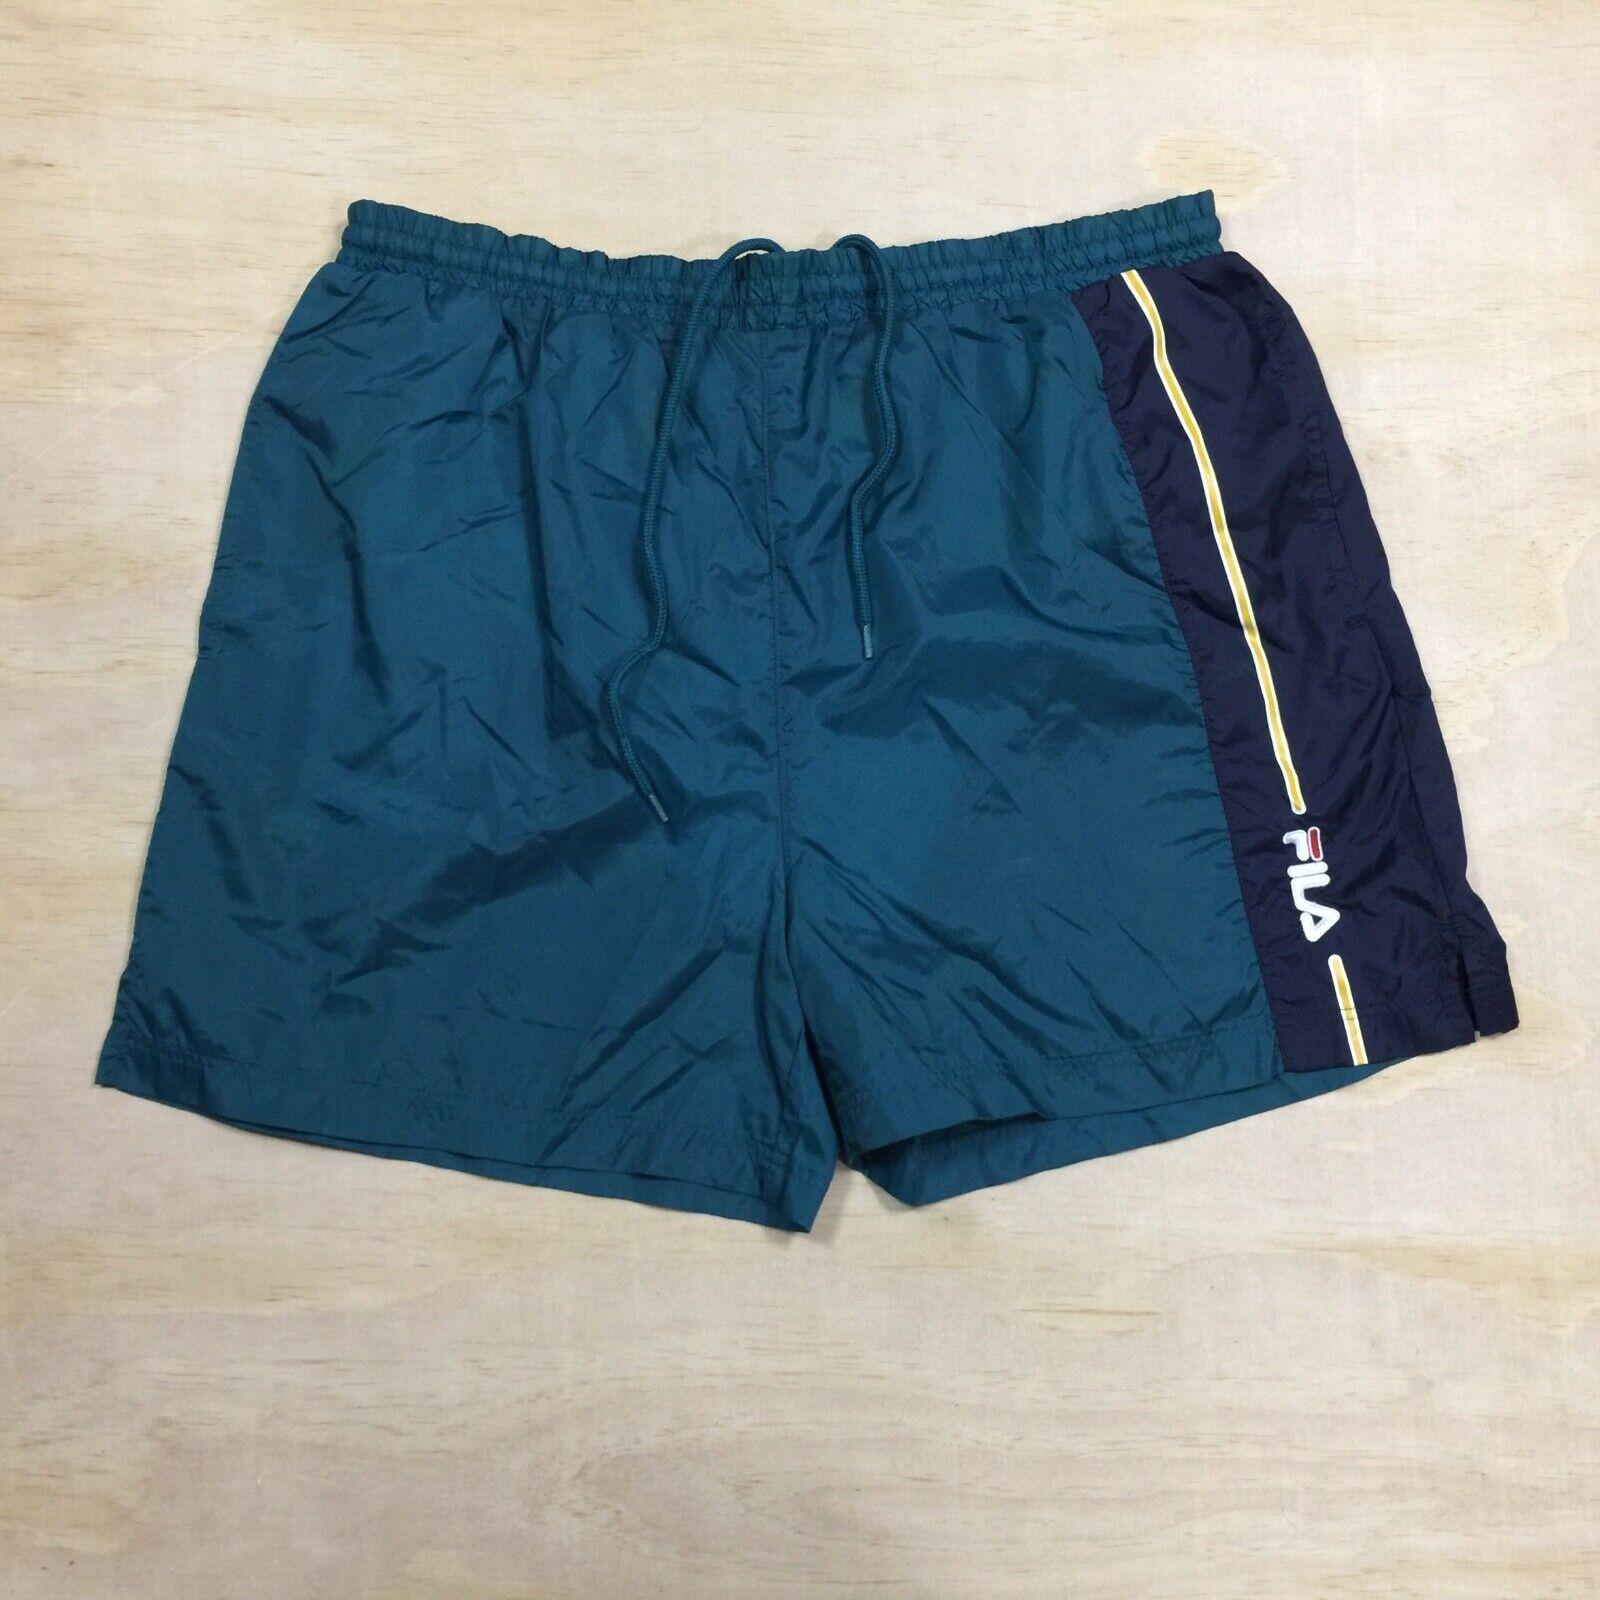 Vintage Retro Fila Swim Trunk Shorts Large